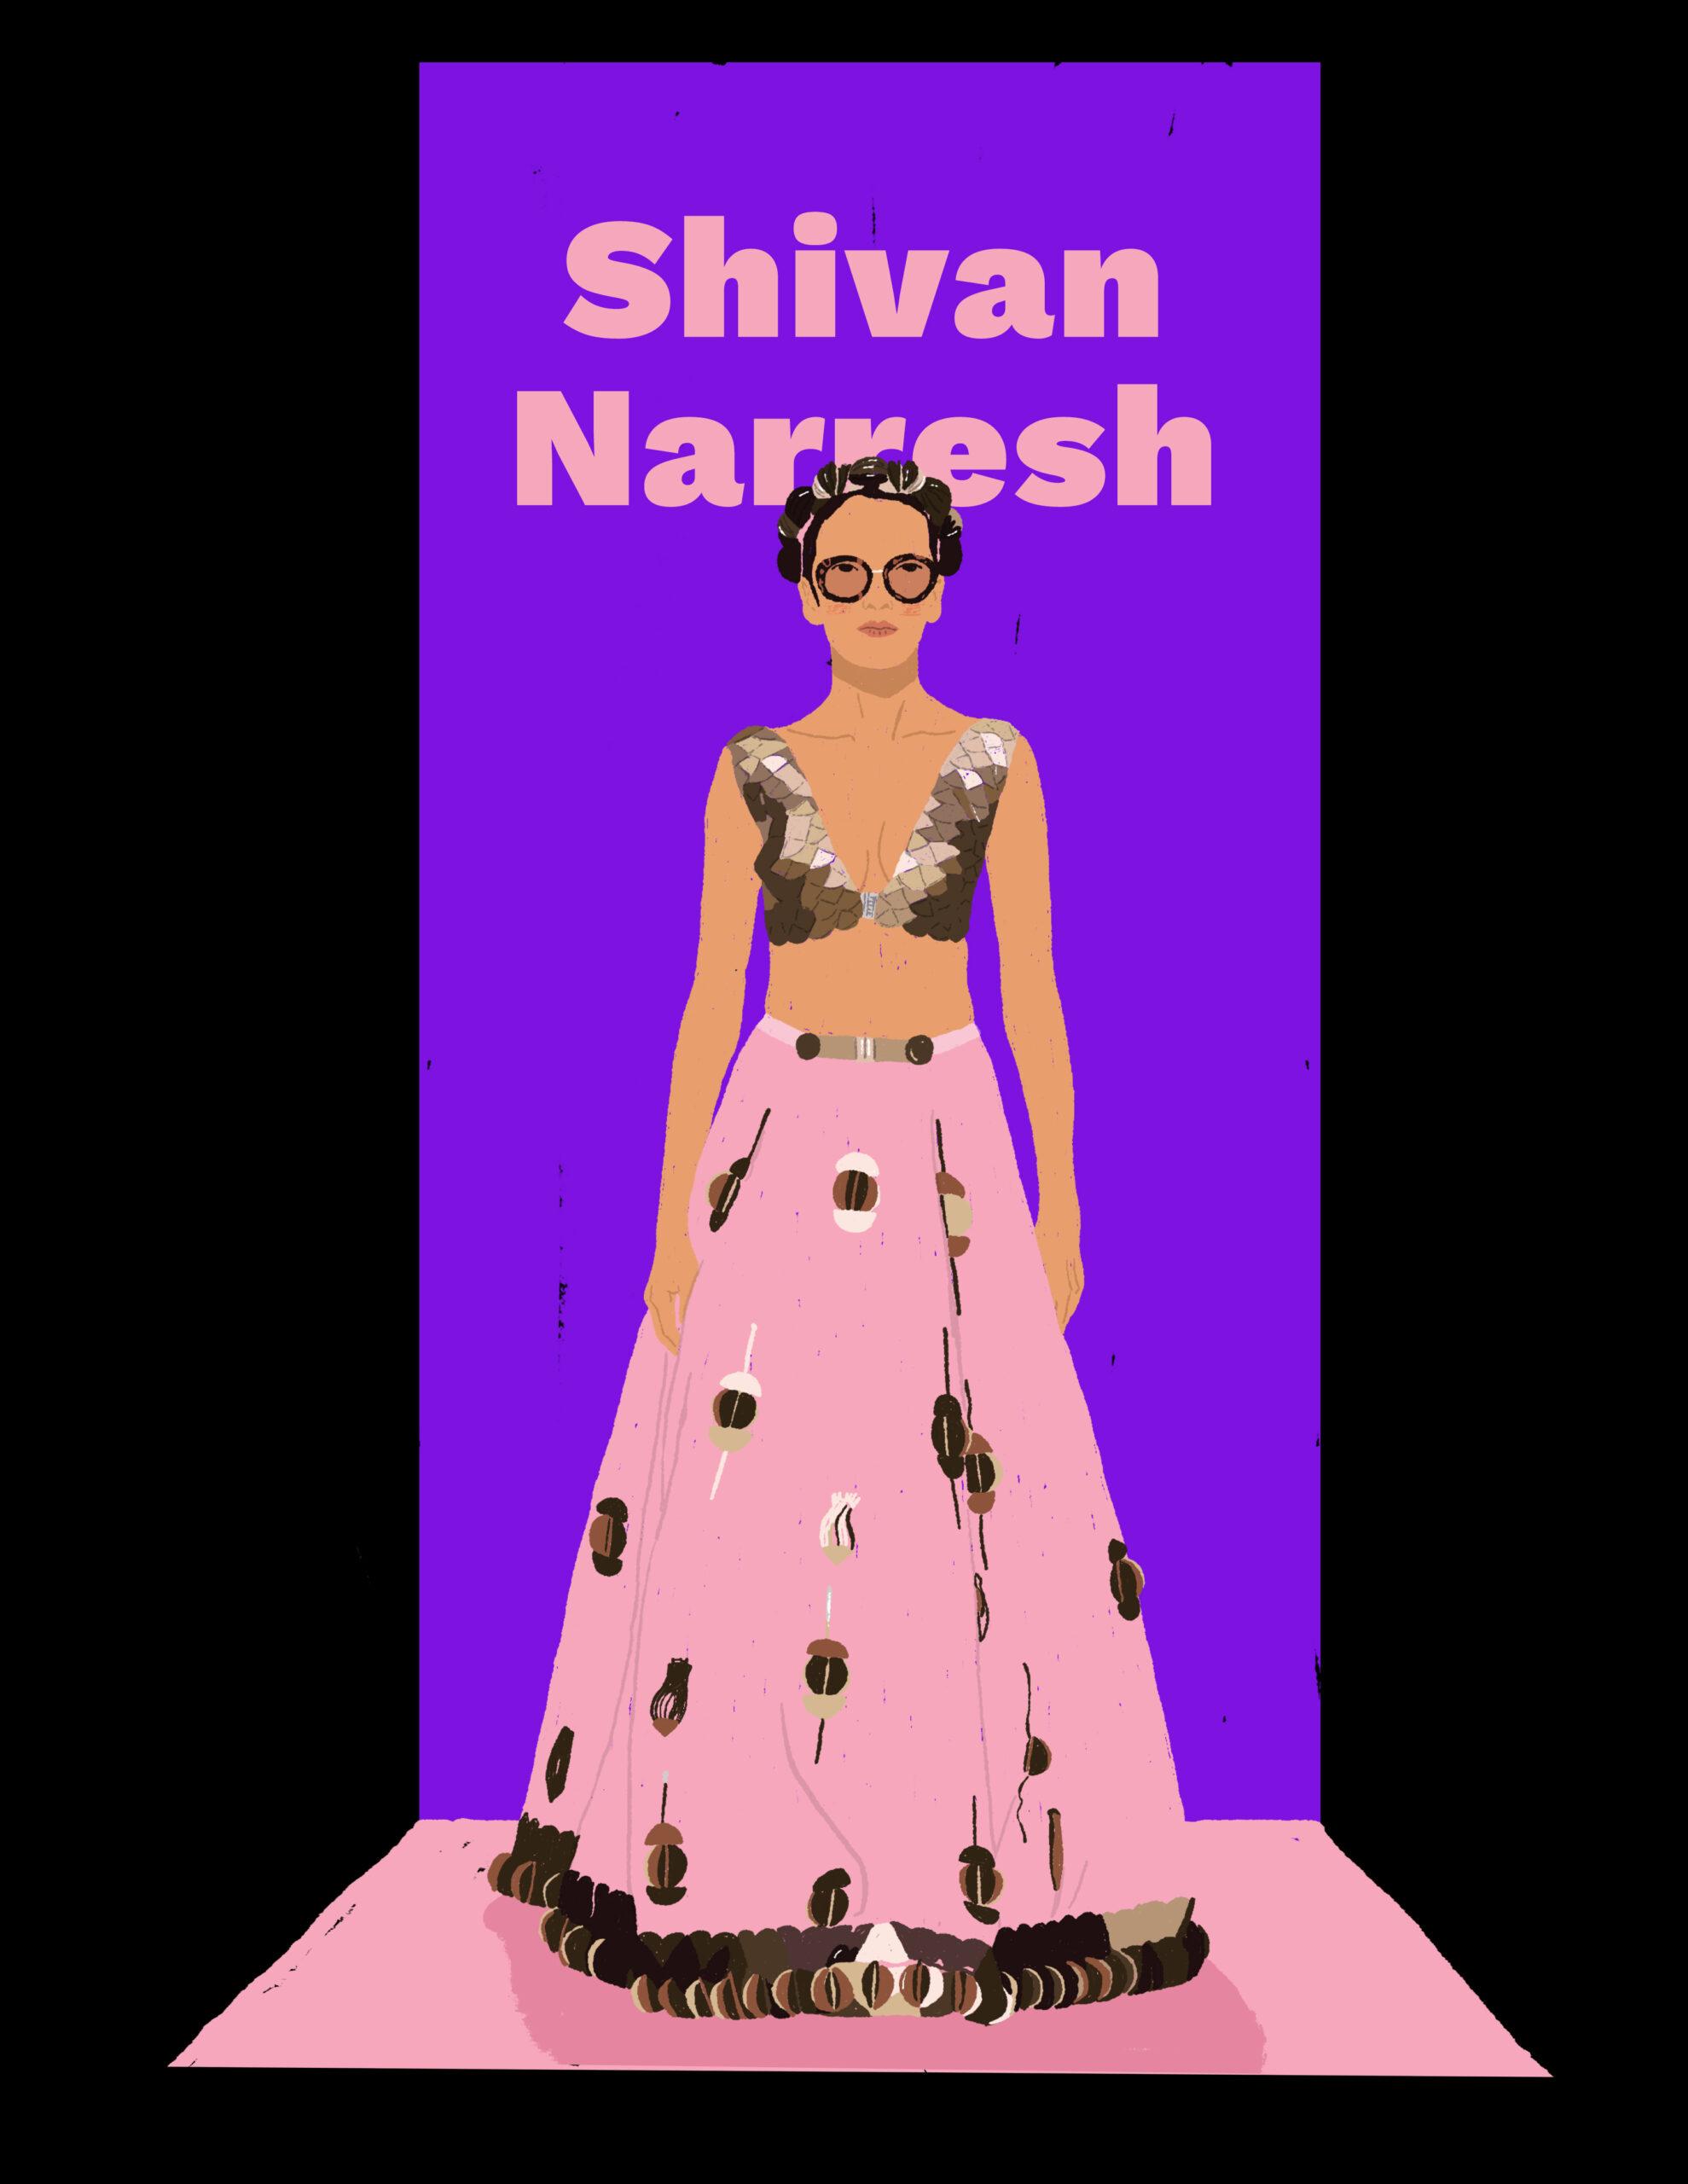 Shivan-Narresh